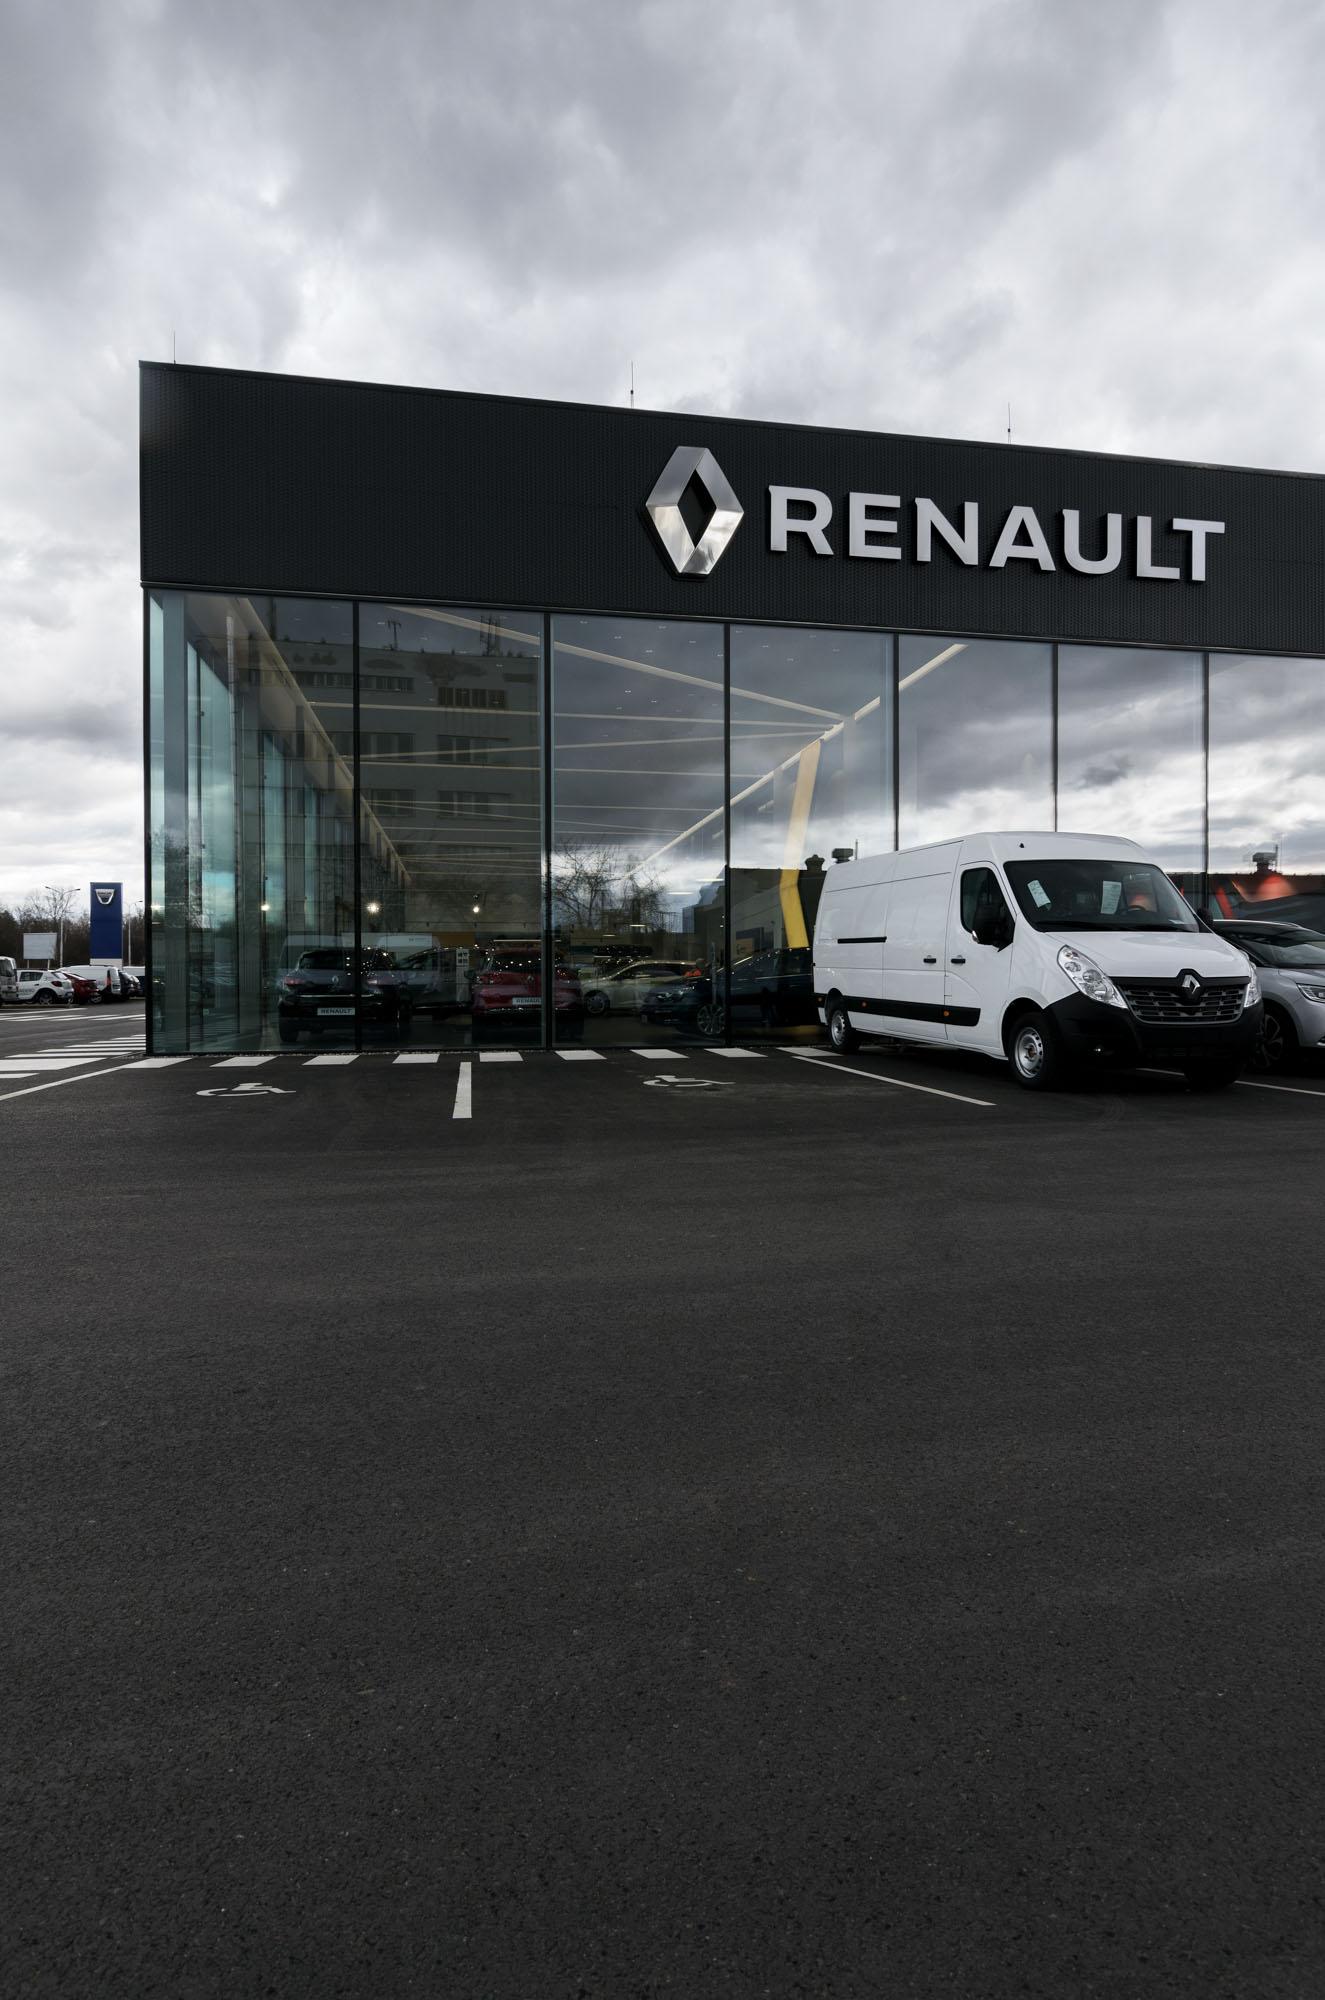 Obsidian Glass Renault Tukas – Fotograf Jiří Alexander Bednář